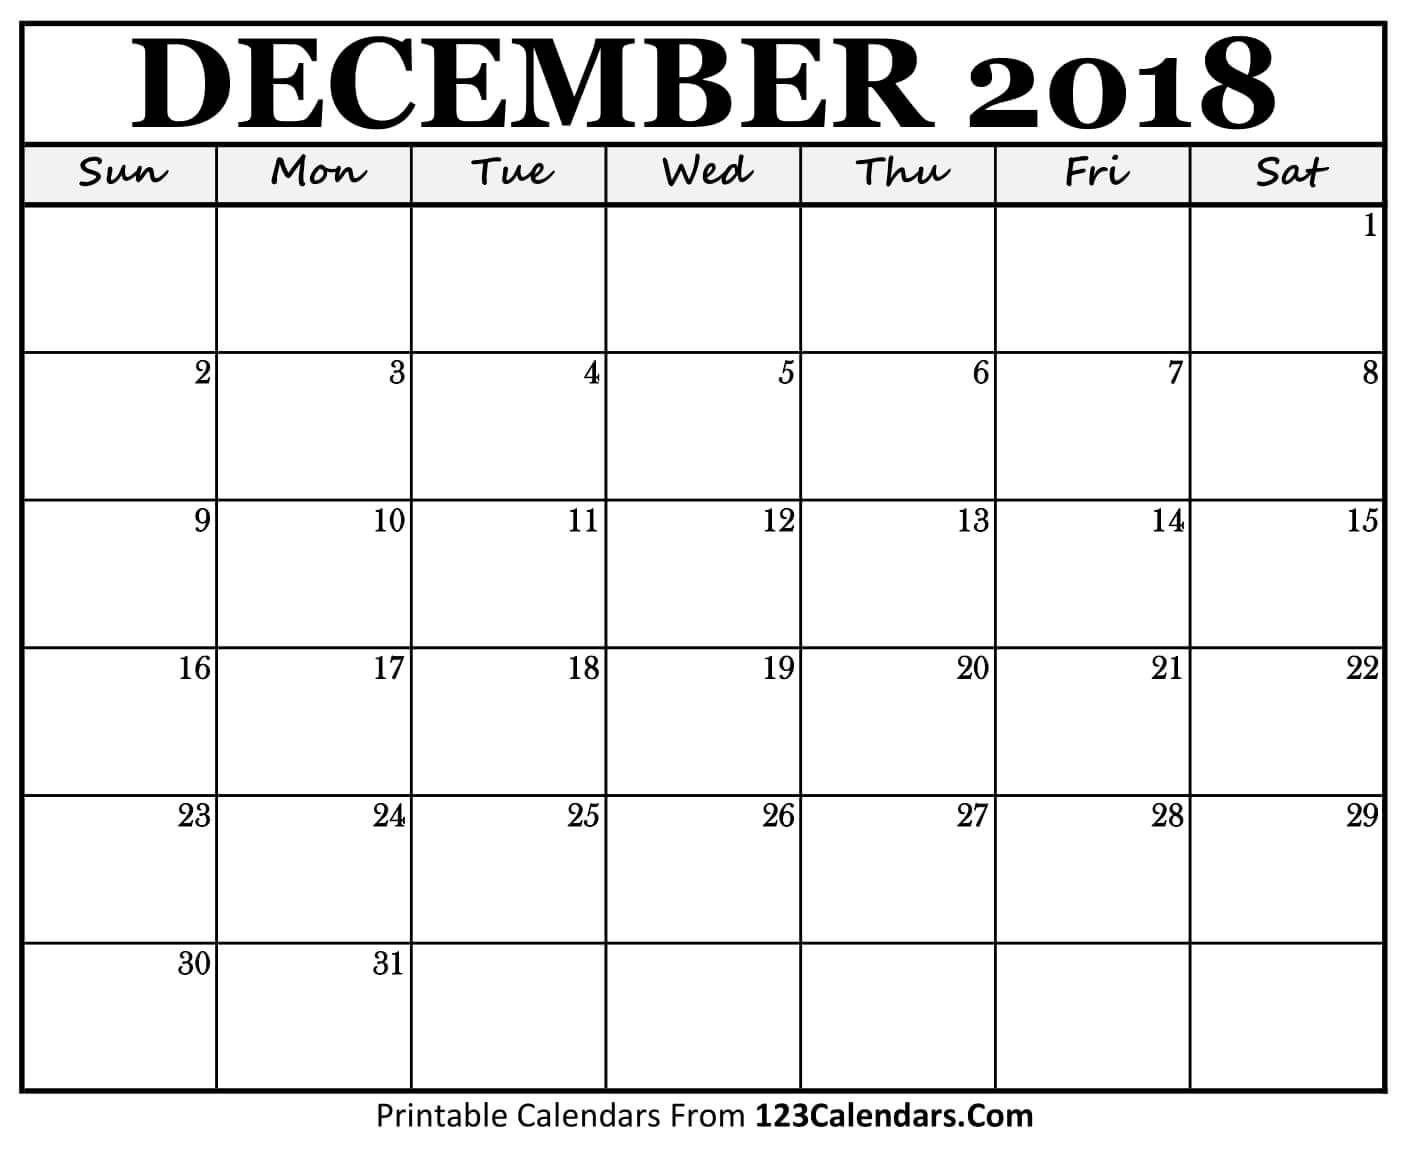 Printable December 2018 Calendar Templates  123Calendars with Printable Calendars From 123Calendars